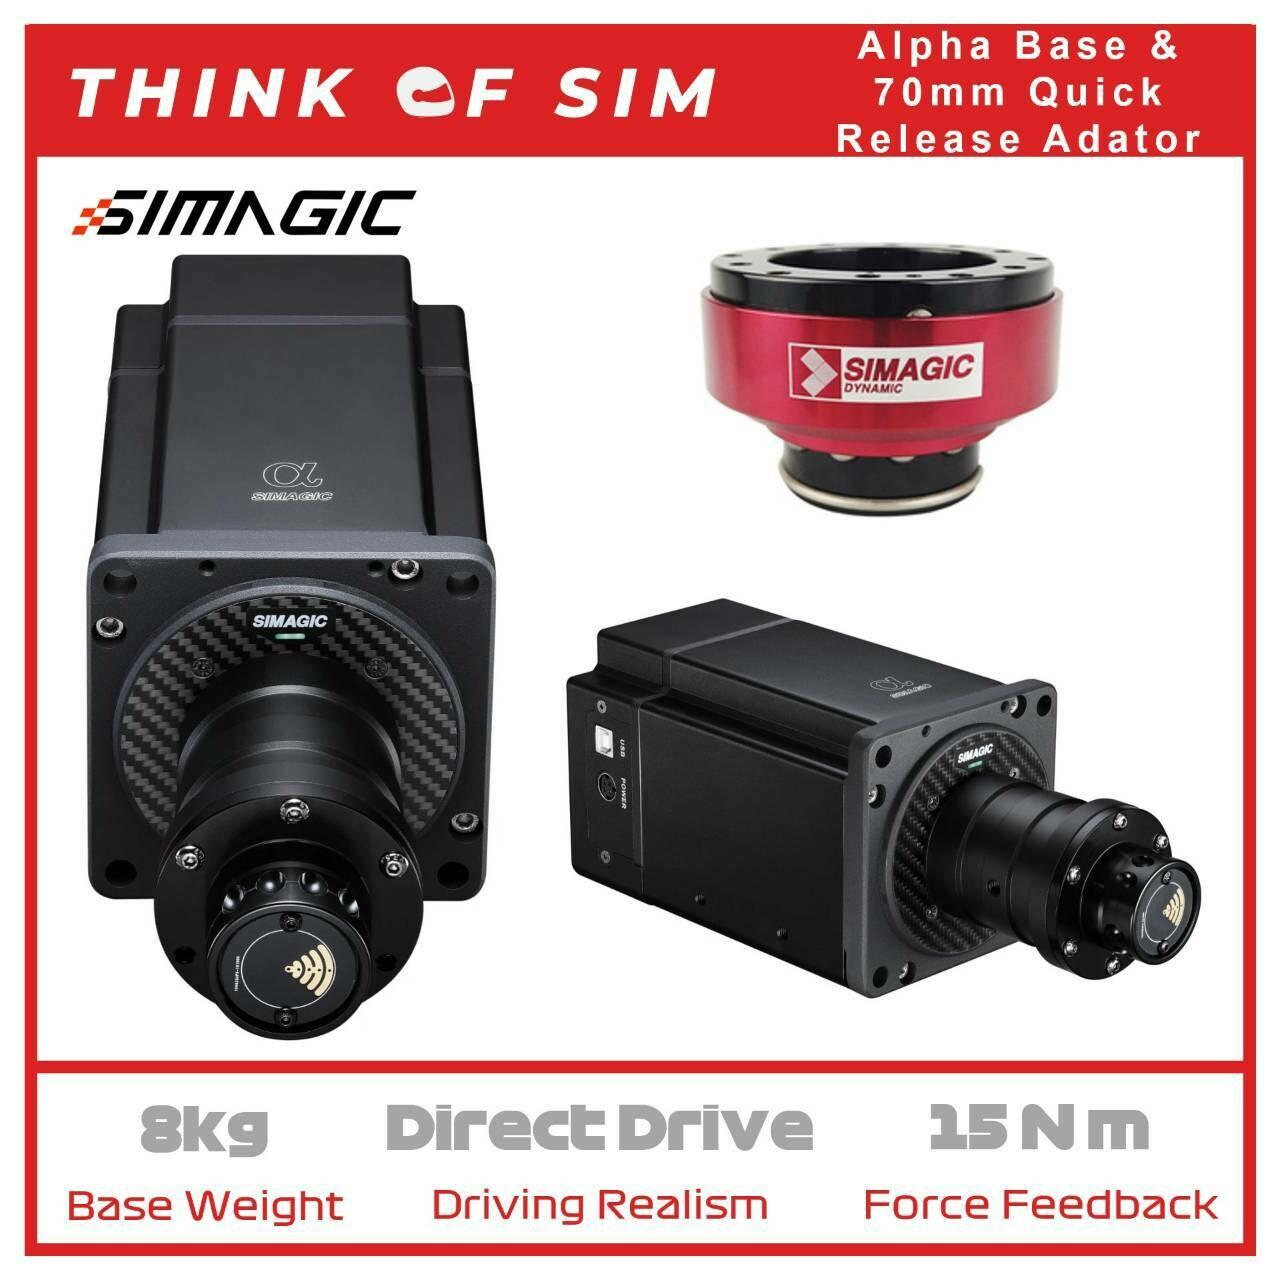 Simagic Alpha Flagship Direct Drive Base for Sim Racing